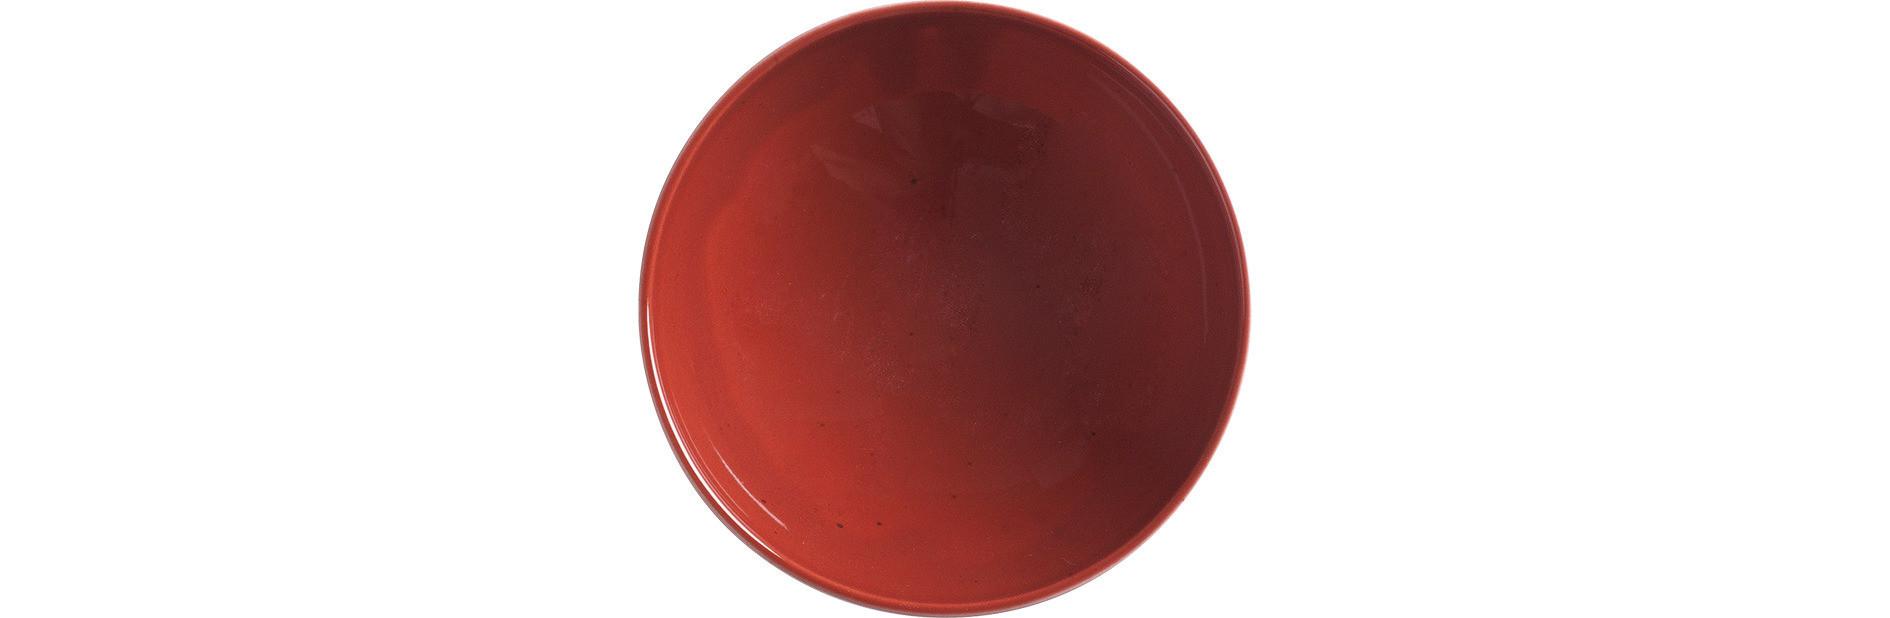 Homestyle, Schale mini ø 110 mm / 0,15 l siena red